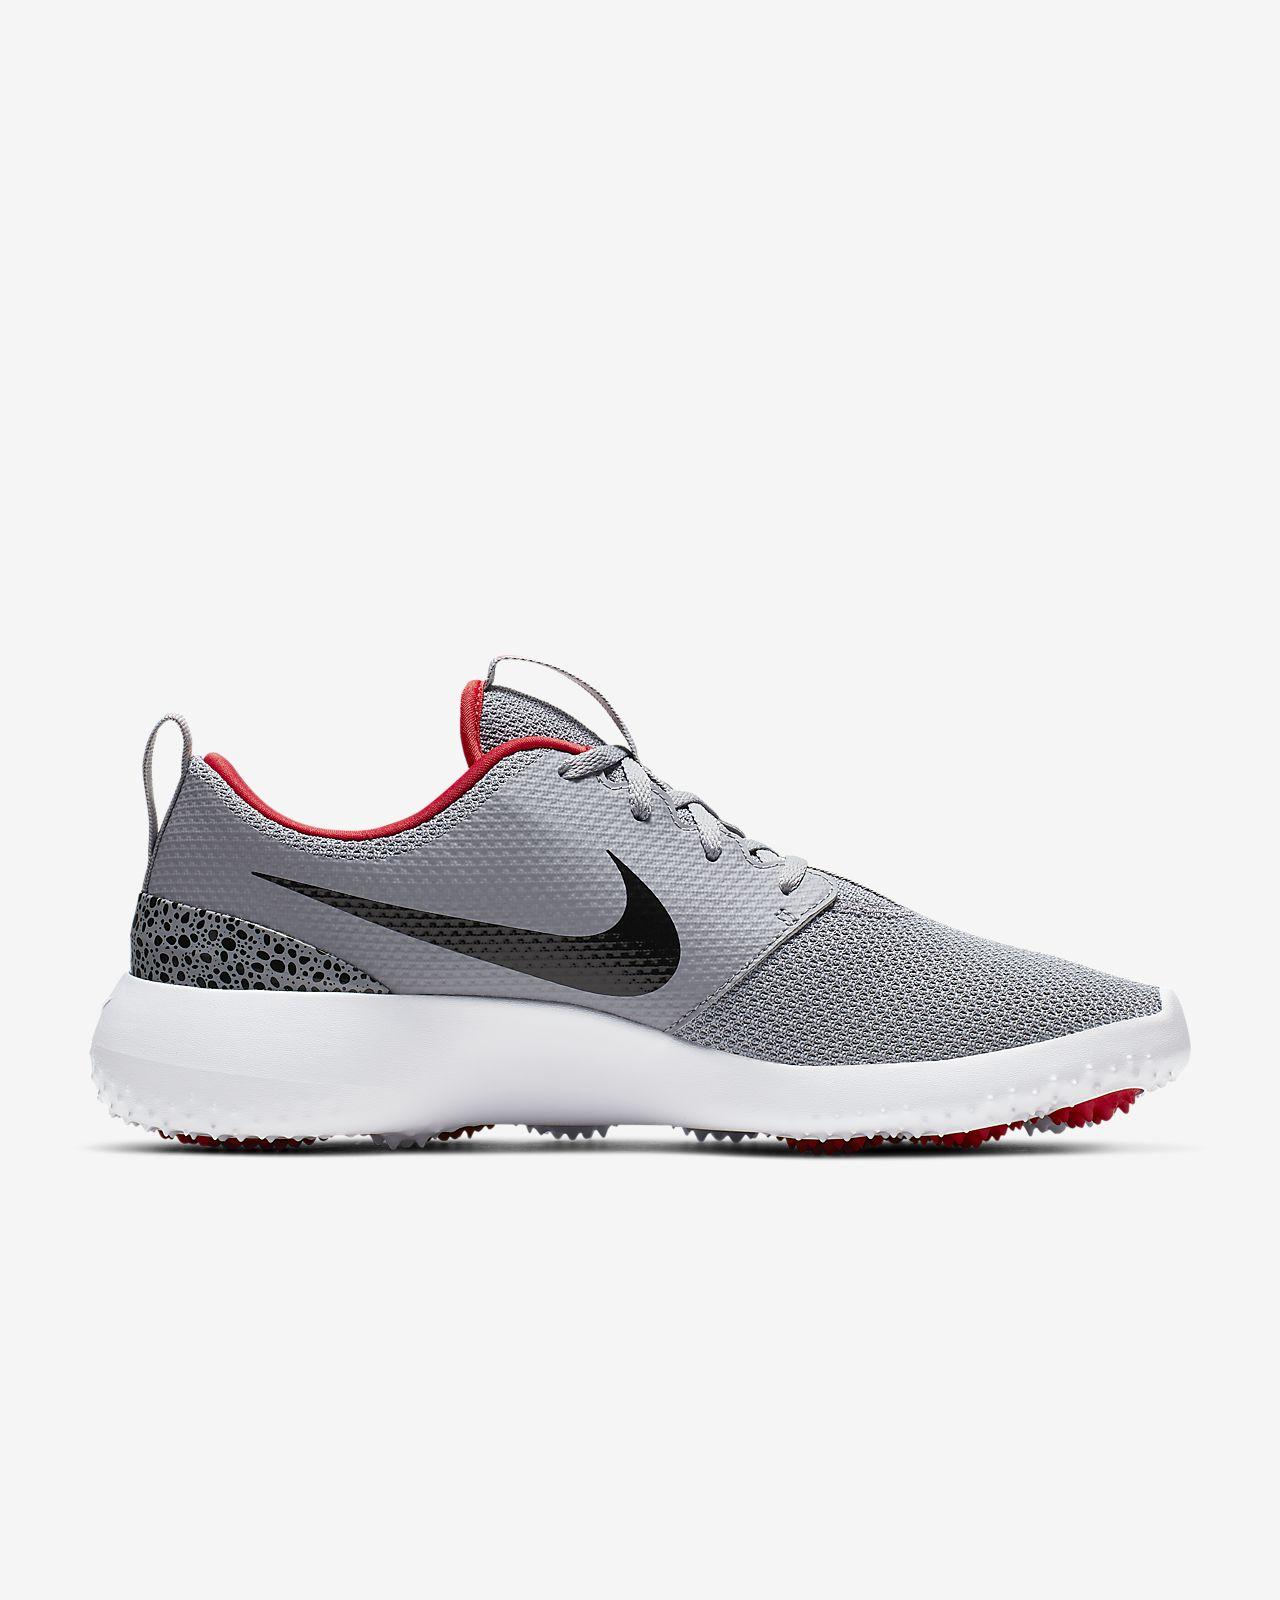 best website 42d4c 67b2d ... Chaussure de golf Nike Roshe G pour Homme